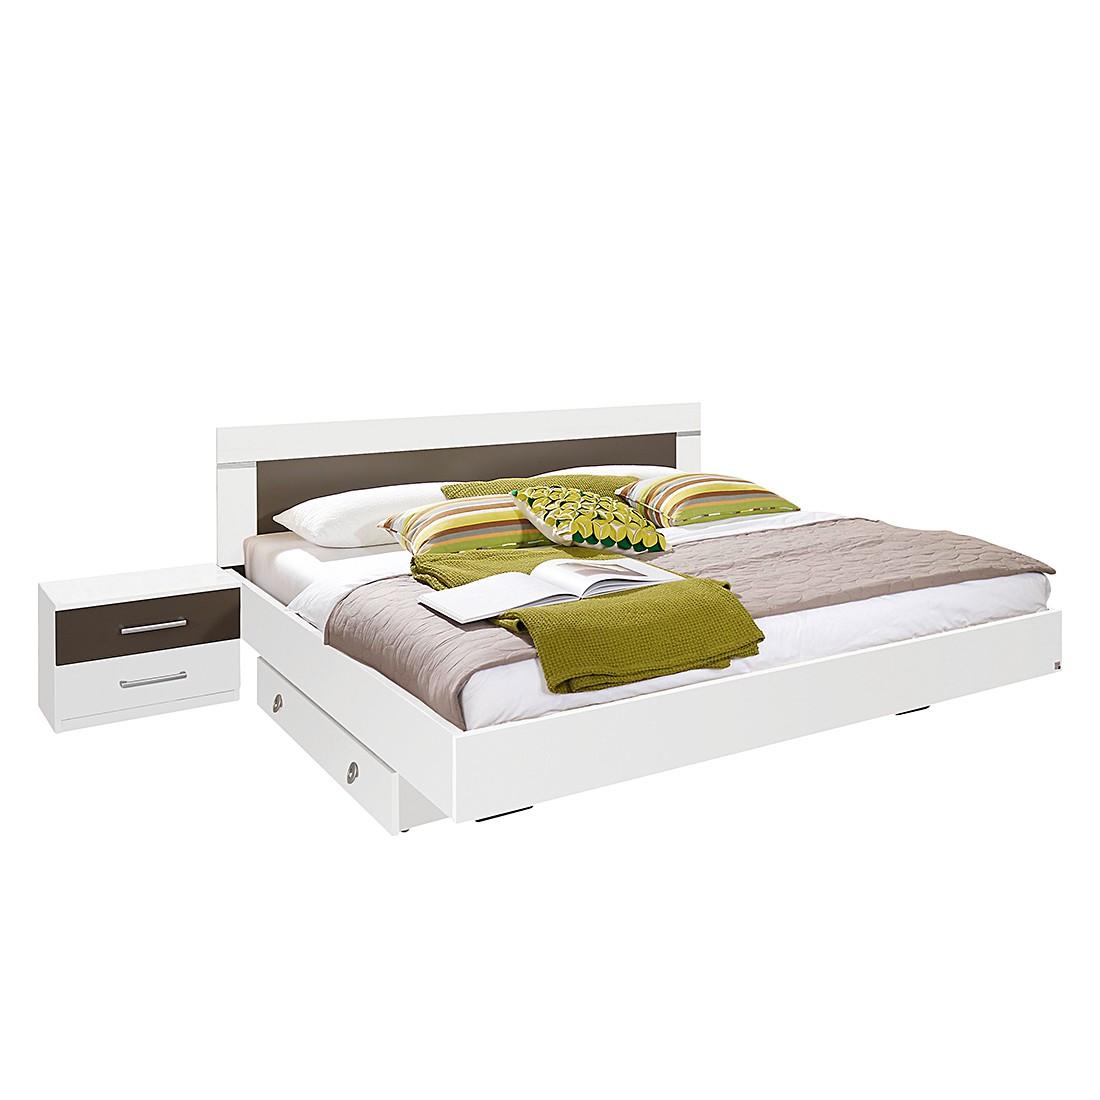 Letto ikea flaxa ikea flaxa twin bed with storage nazarm for Ikea letto flaxa